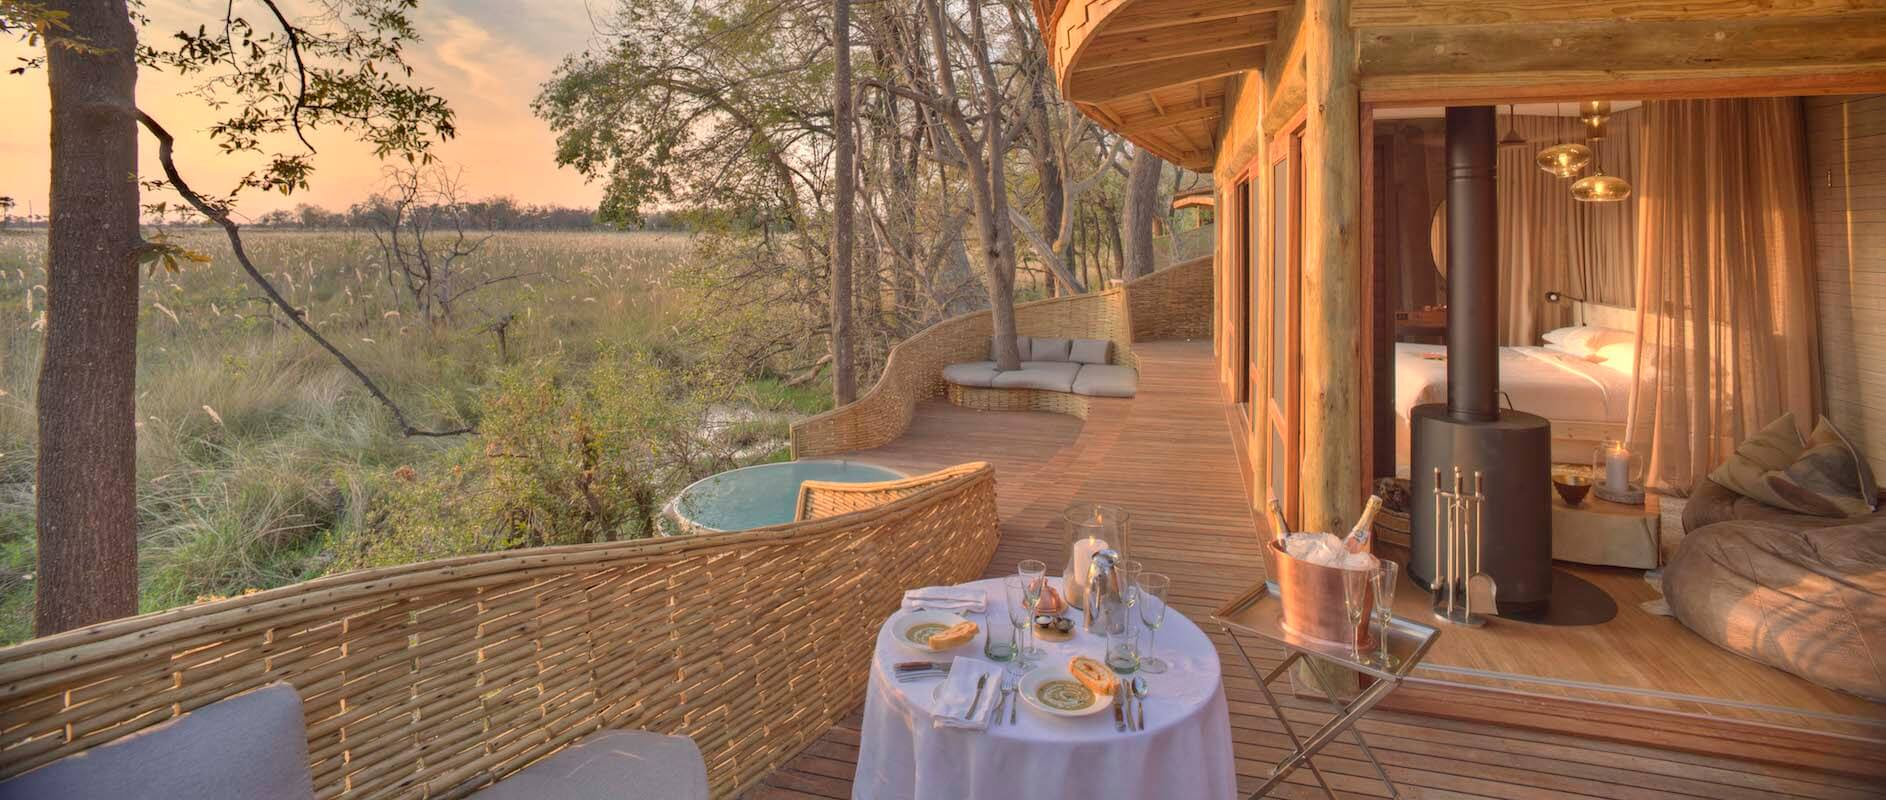 Botswana_OkavangoDelta_andBeyondSandibe_Wildlife_Private Dining In Room